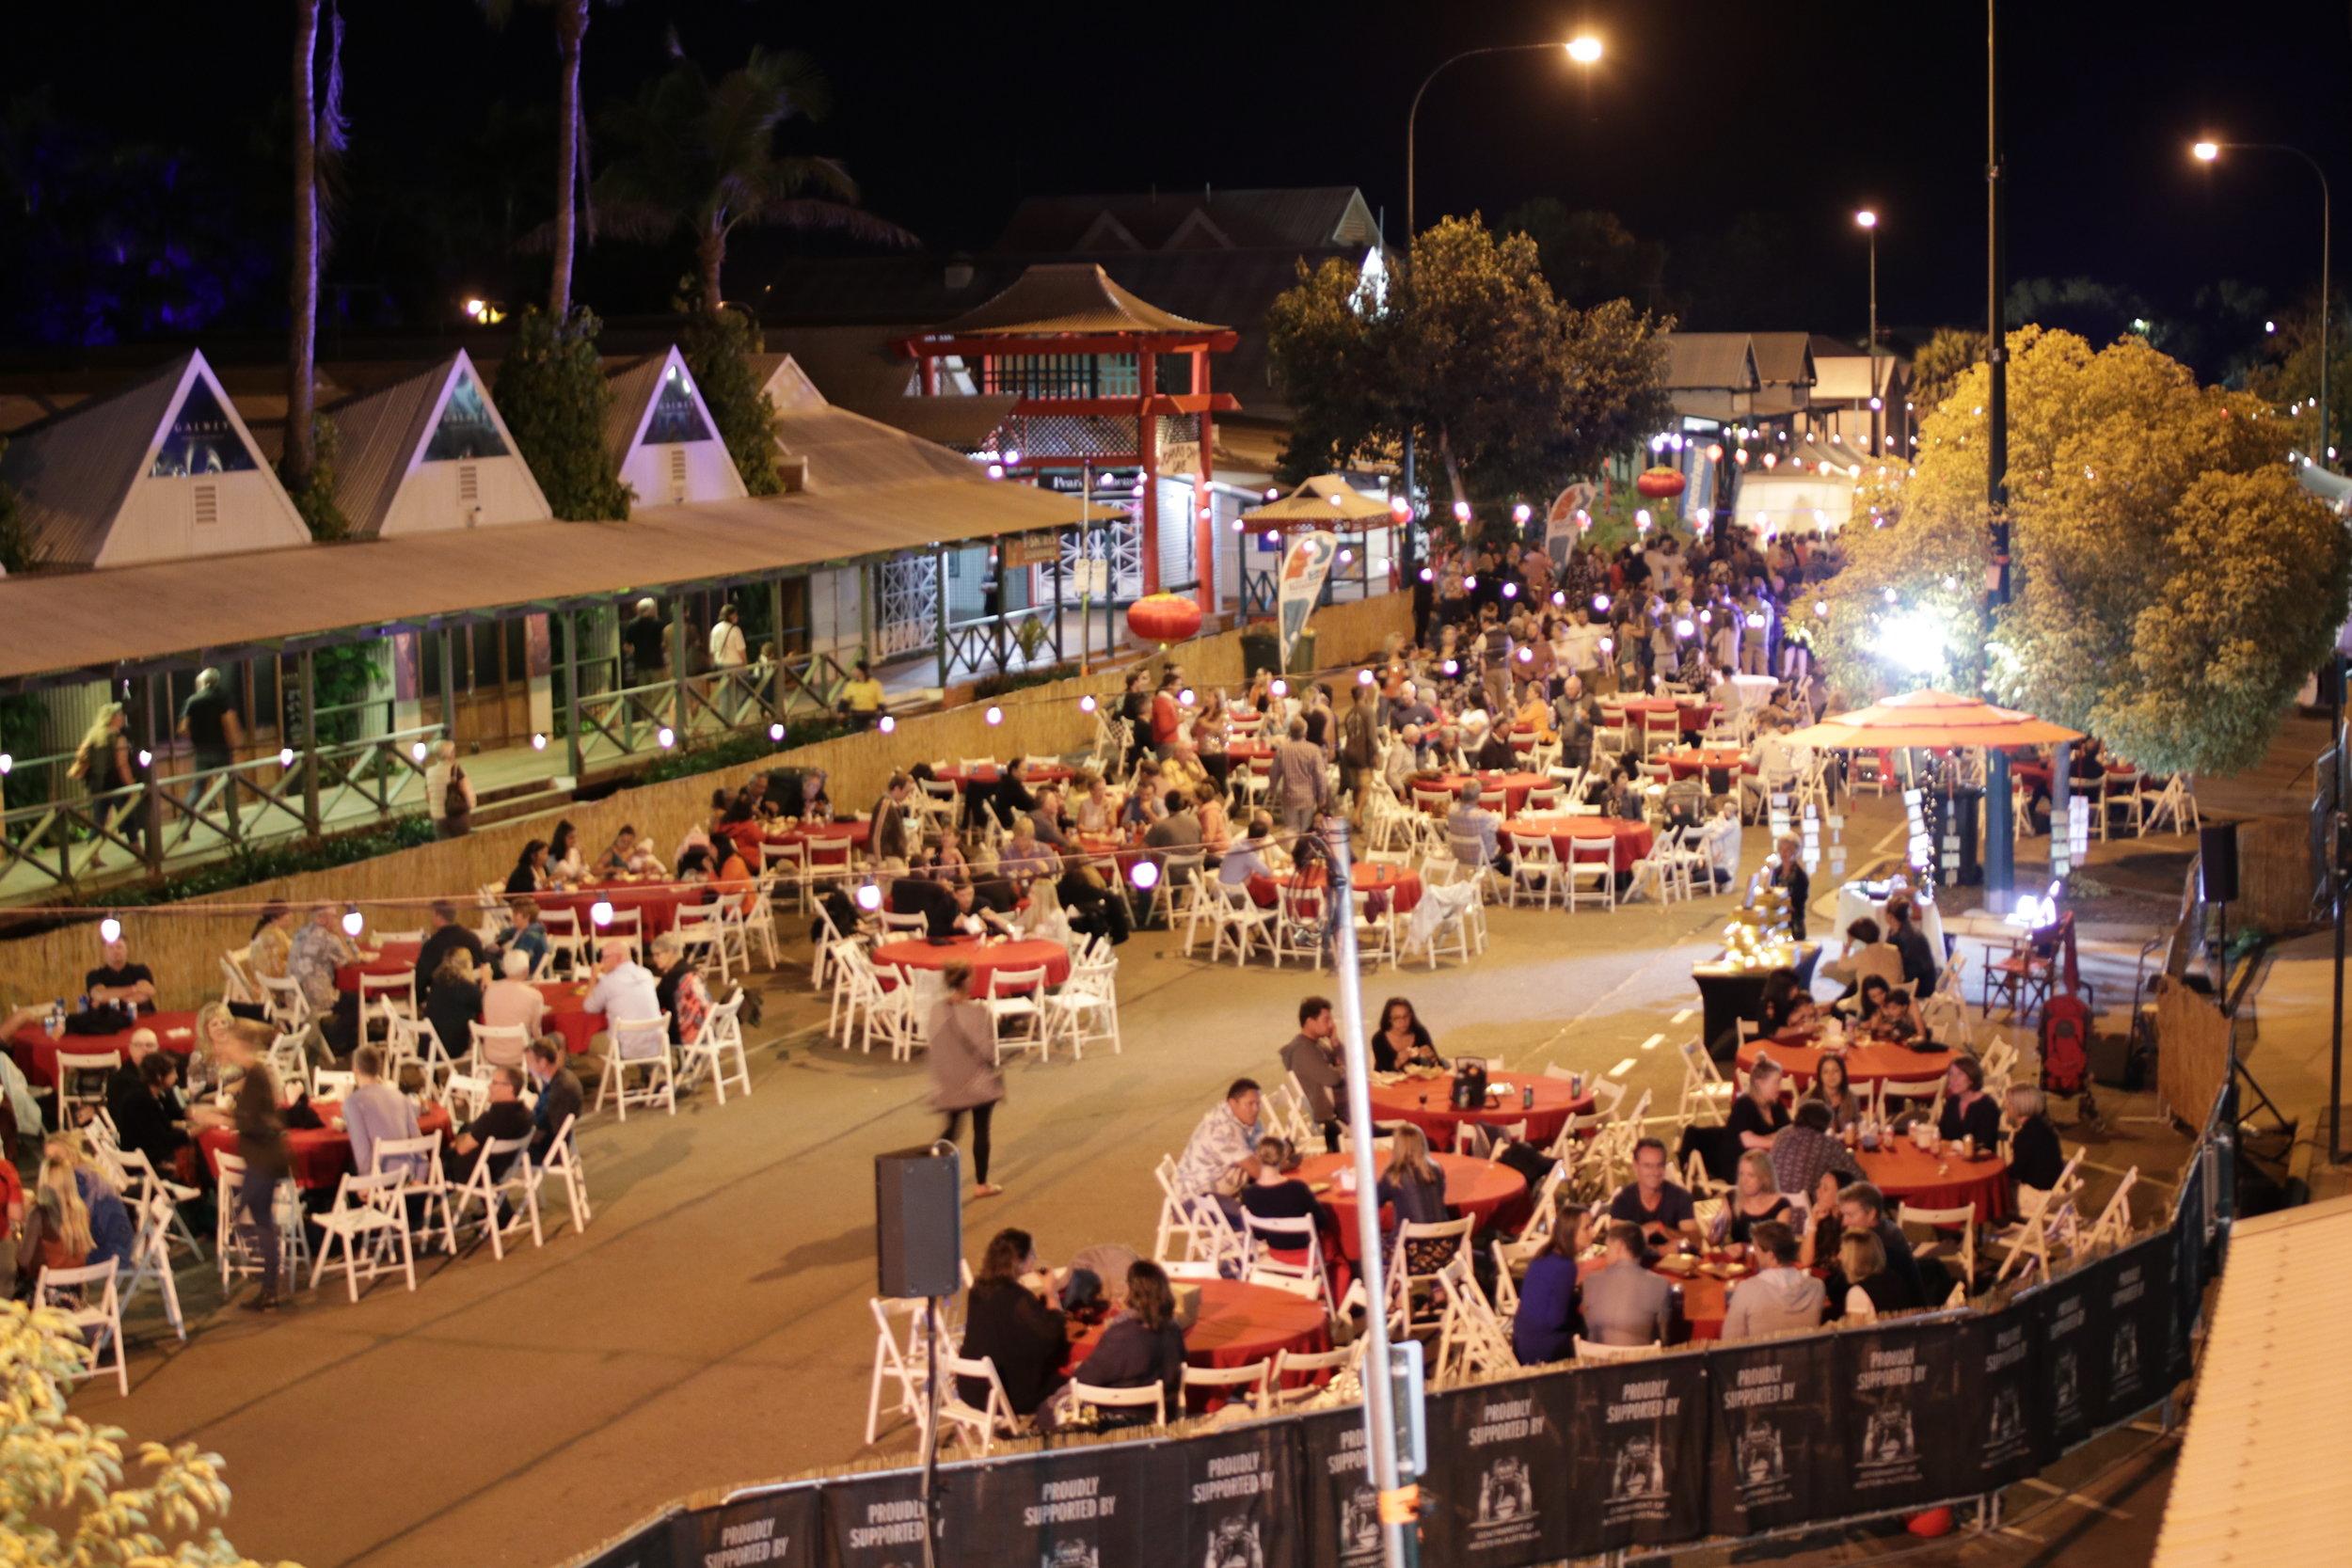 The streets of Broome come to life for the Pearl Harvest Yum Cha during Shinju Matsuri Photo: Brandon Stirrup